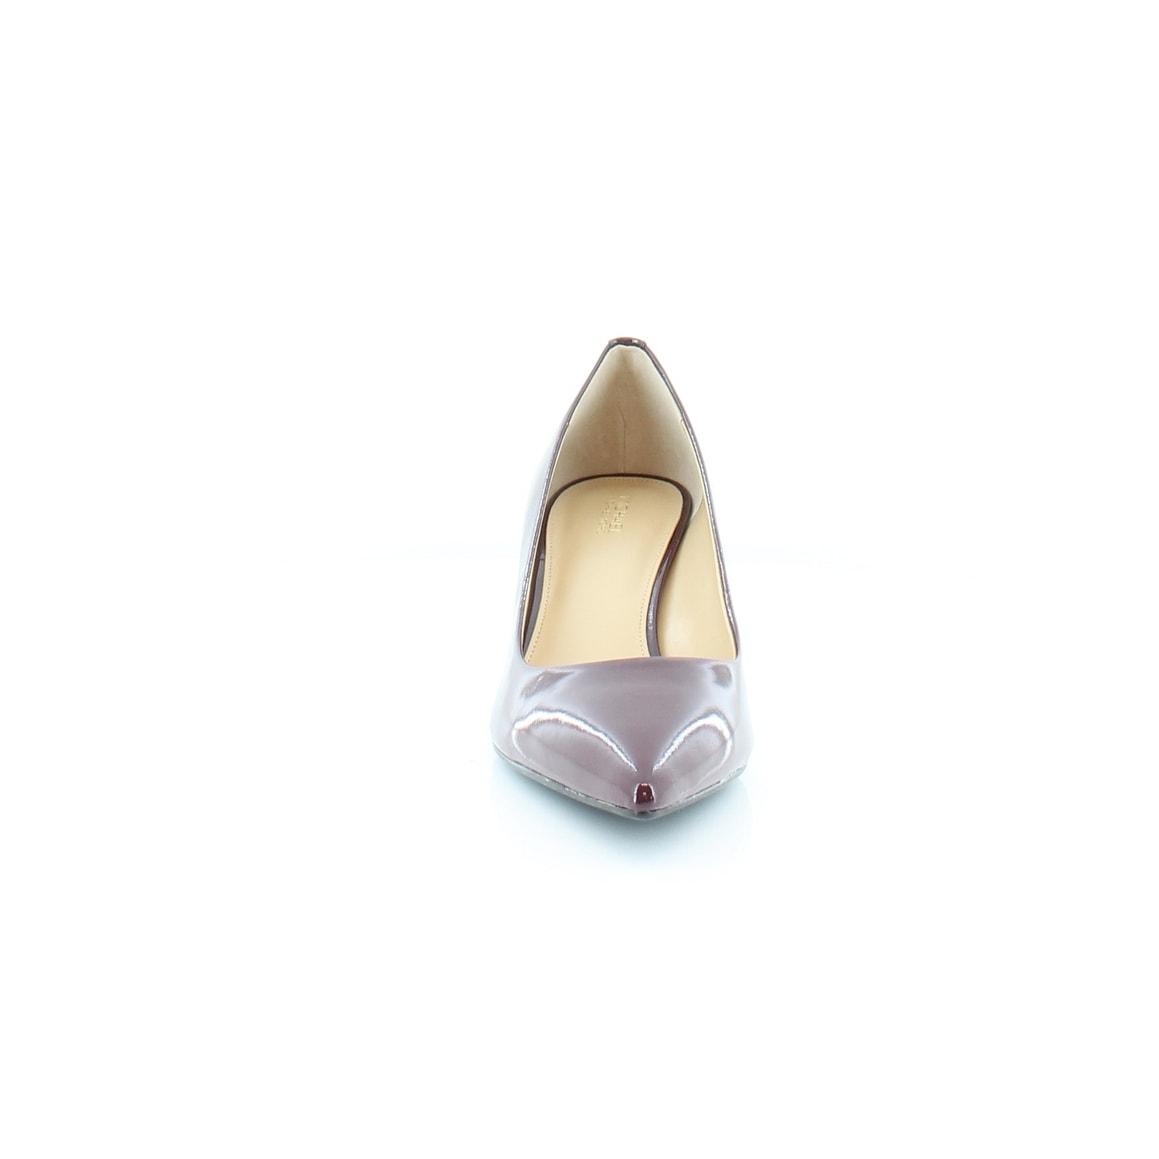 16df7d00f9c Shop Michael Kors MK Flex Women s Heels Plum - 7.5 - Free Shipping Today -  Overstock - 23550604